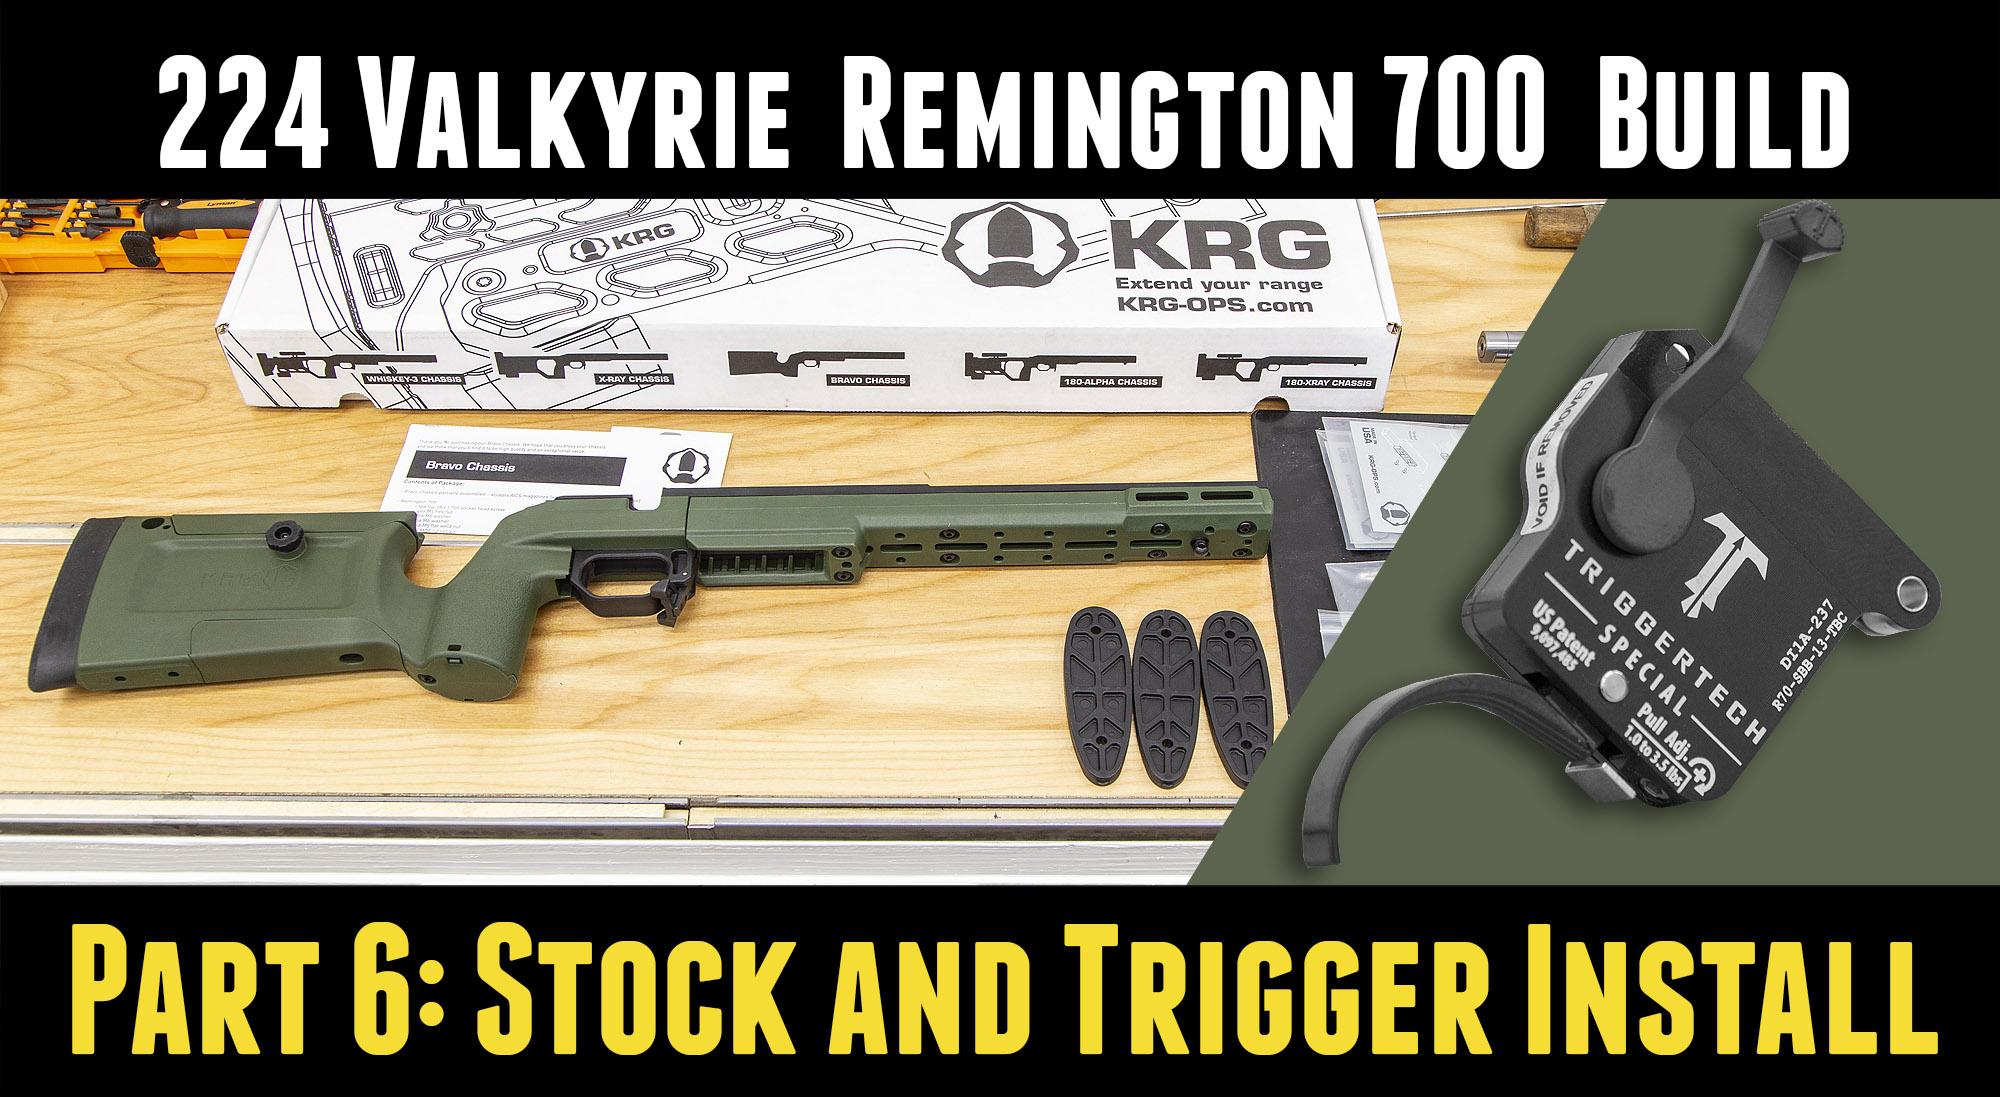 224 Valkyrie Remington 700 Build P6: KRG Bravo Stock, TriggerTech Special Trigger